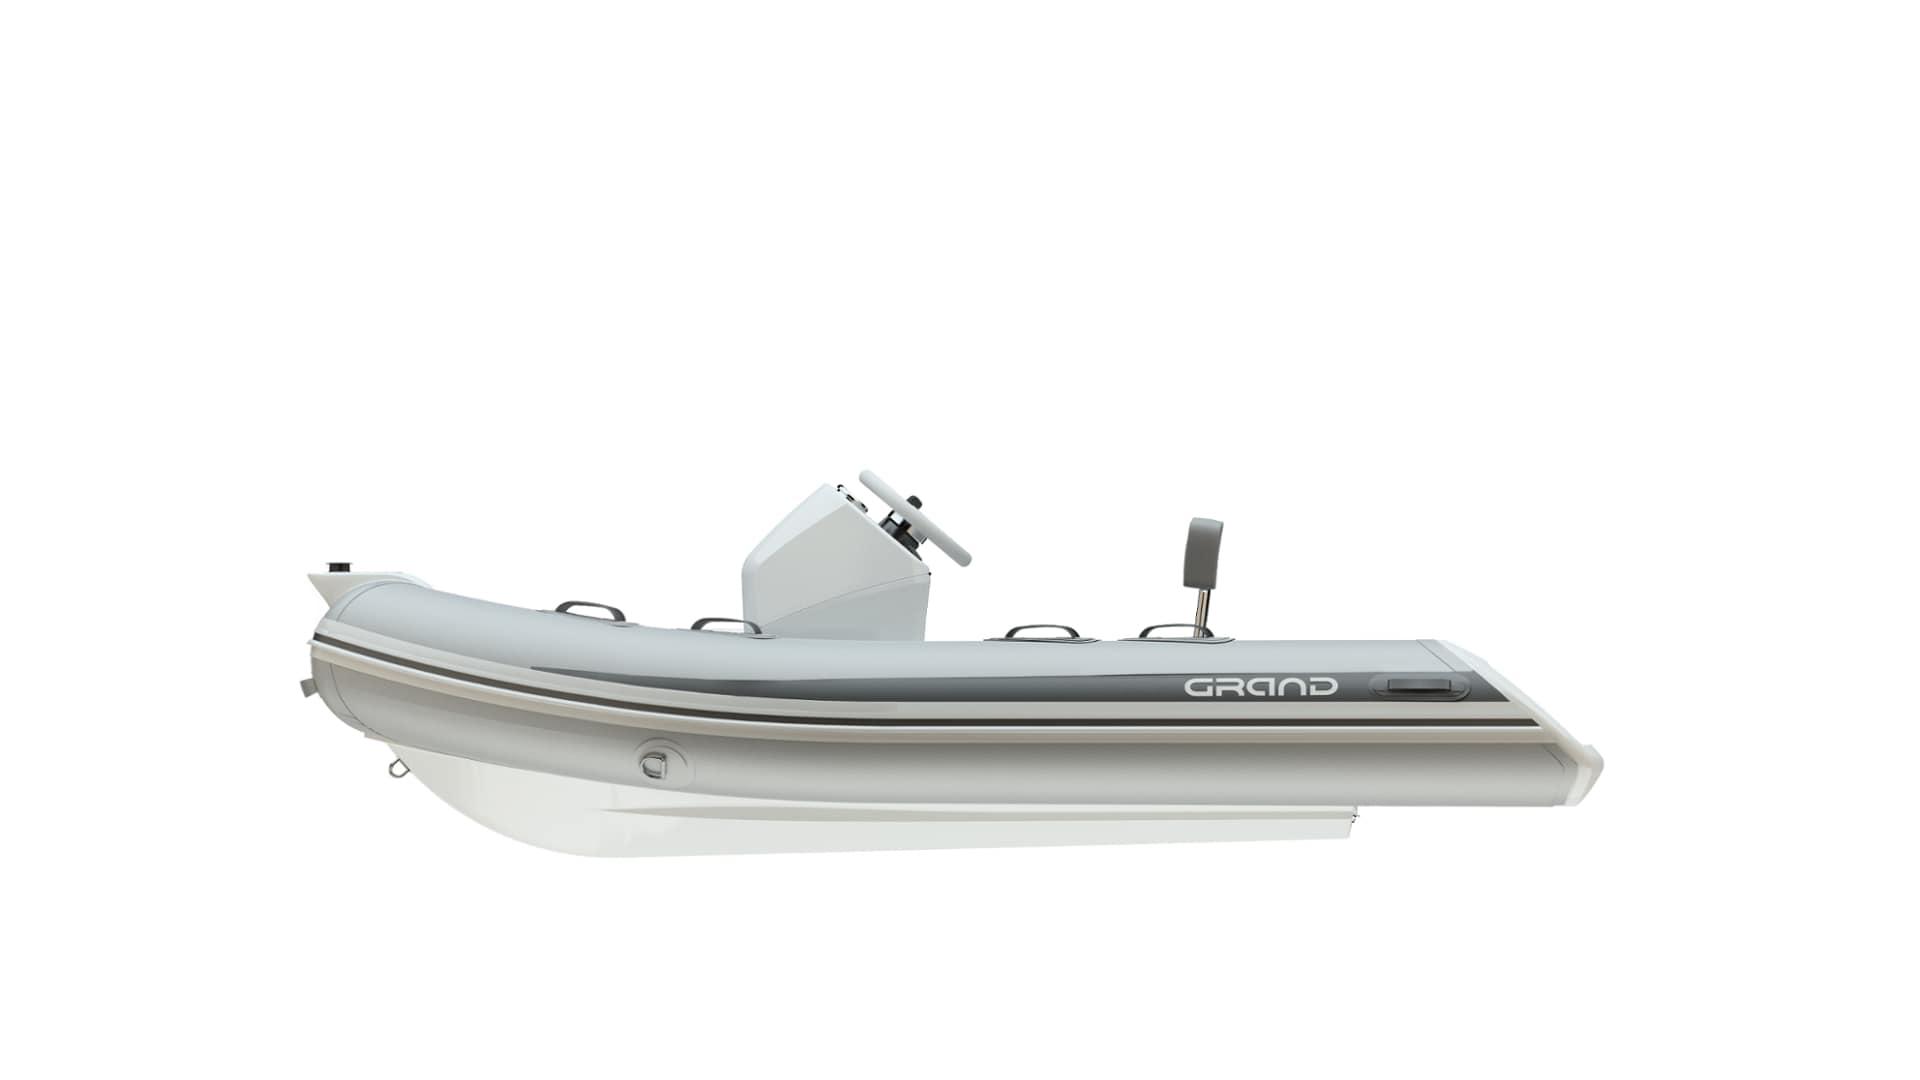 GRAND Silver Line S300L, GRAND S300L, S3300NL, GRAND Silver Line S300L, GRAND Silver Line S300L, GRAND S300L, GRAND S300L, S300L, S300L, Надувная лодка GRAND, Надувная лодка ГРАНД, Надувная лодка с жестким дном, RIB, Rigid Inflatable Boats